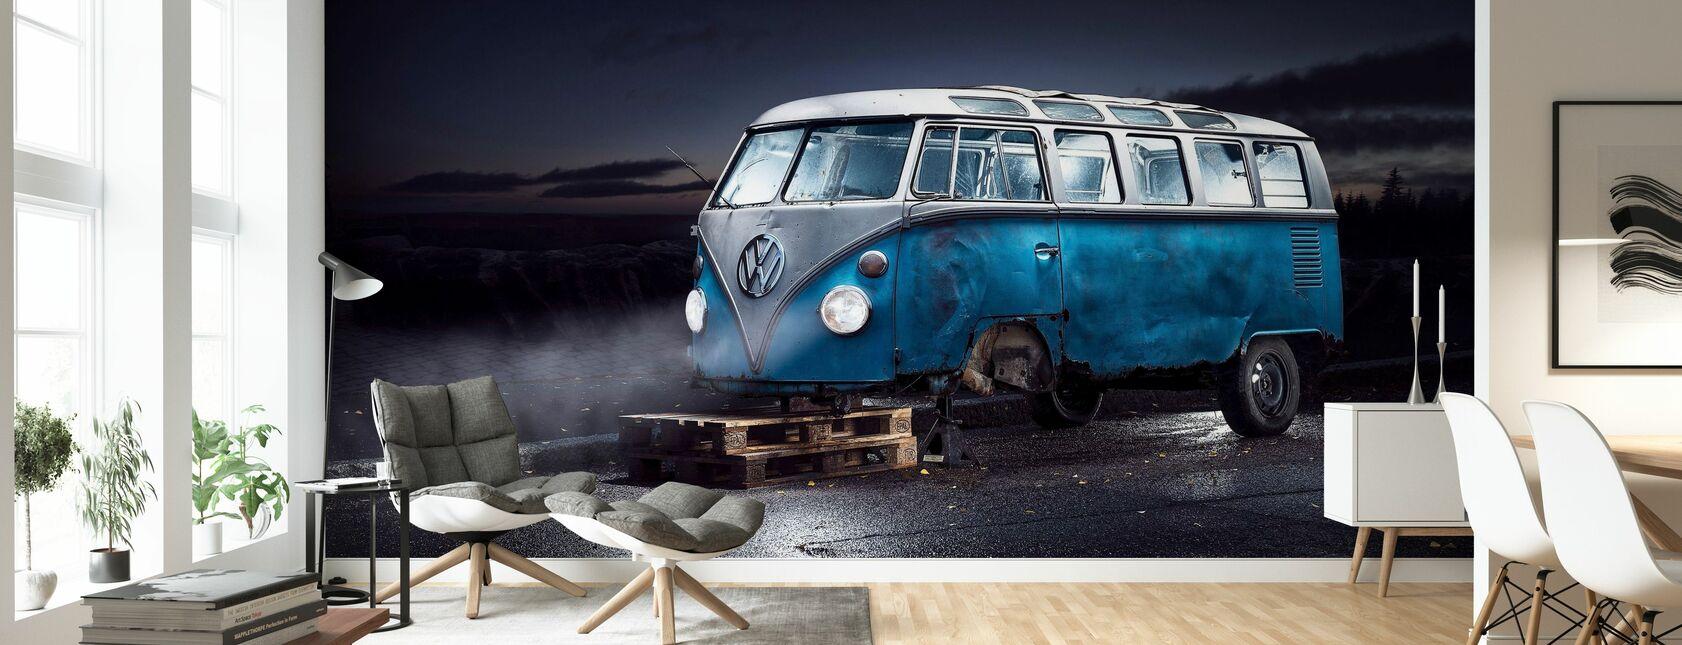 VW minibuss - Tapet - Stue